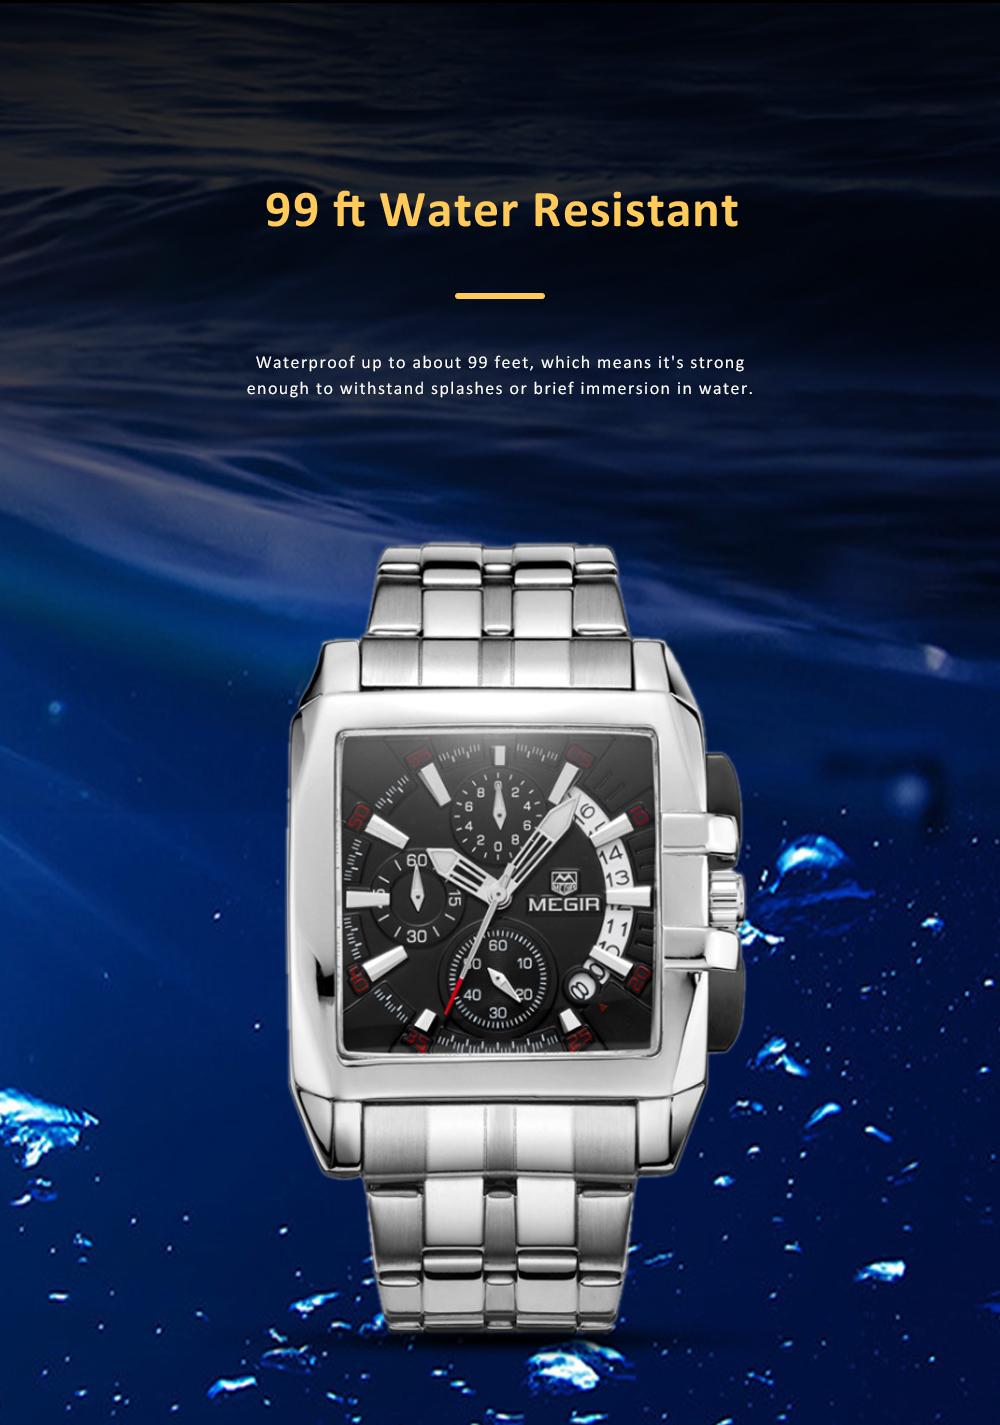 Men's Sports Watch Square Quartz Movement 3ATM Waterproof and Multi Function Wrist Watch 8